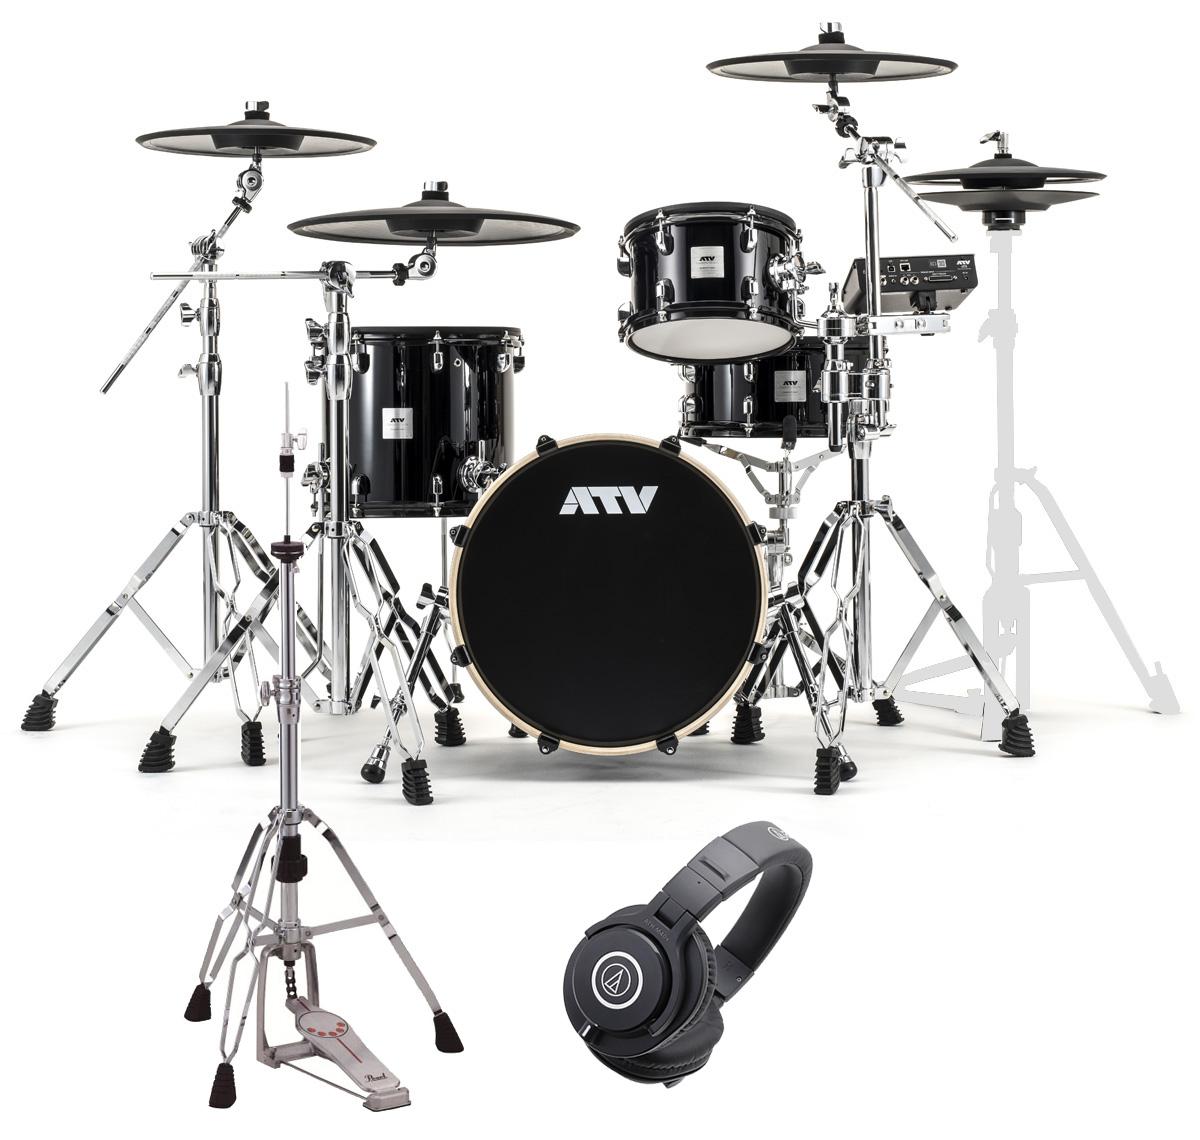 ATV / aDrums artist Standard Set ADA-STDSET 3シンバルセット HHスタンドとヘッドホンM40x付き《予約注文/納期12月上旬頃予定》